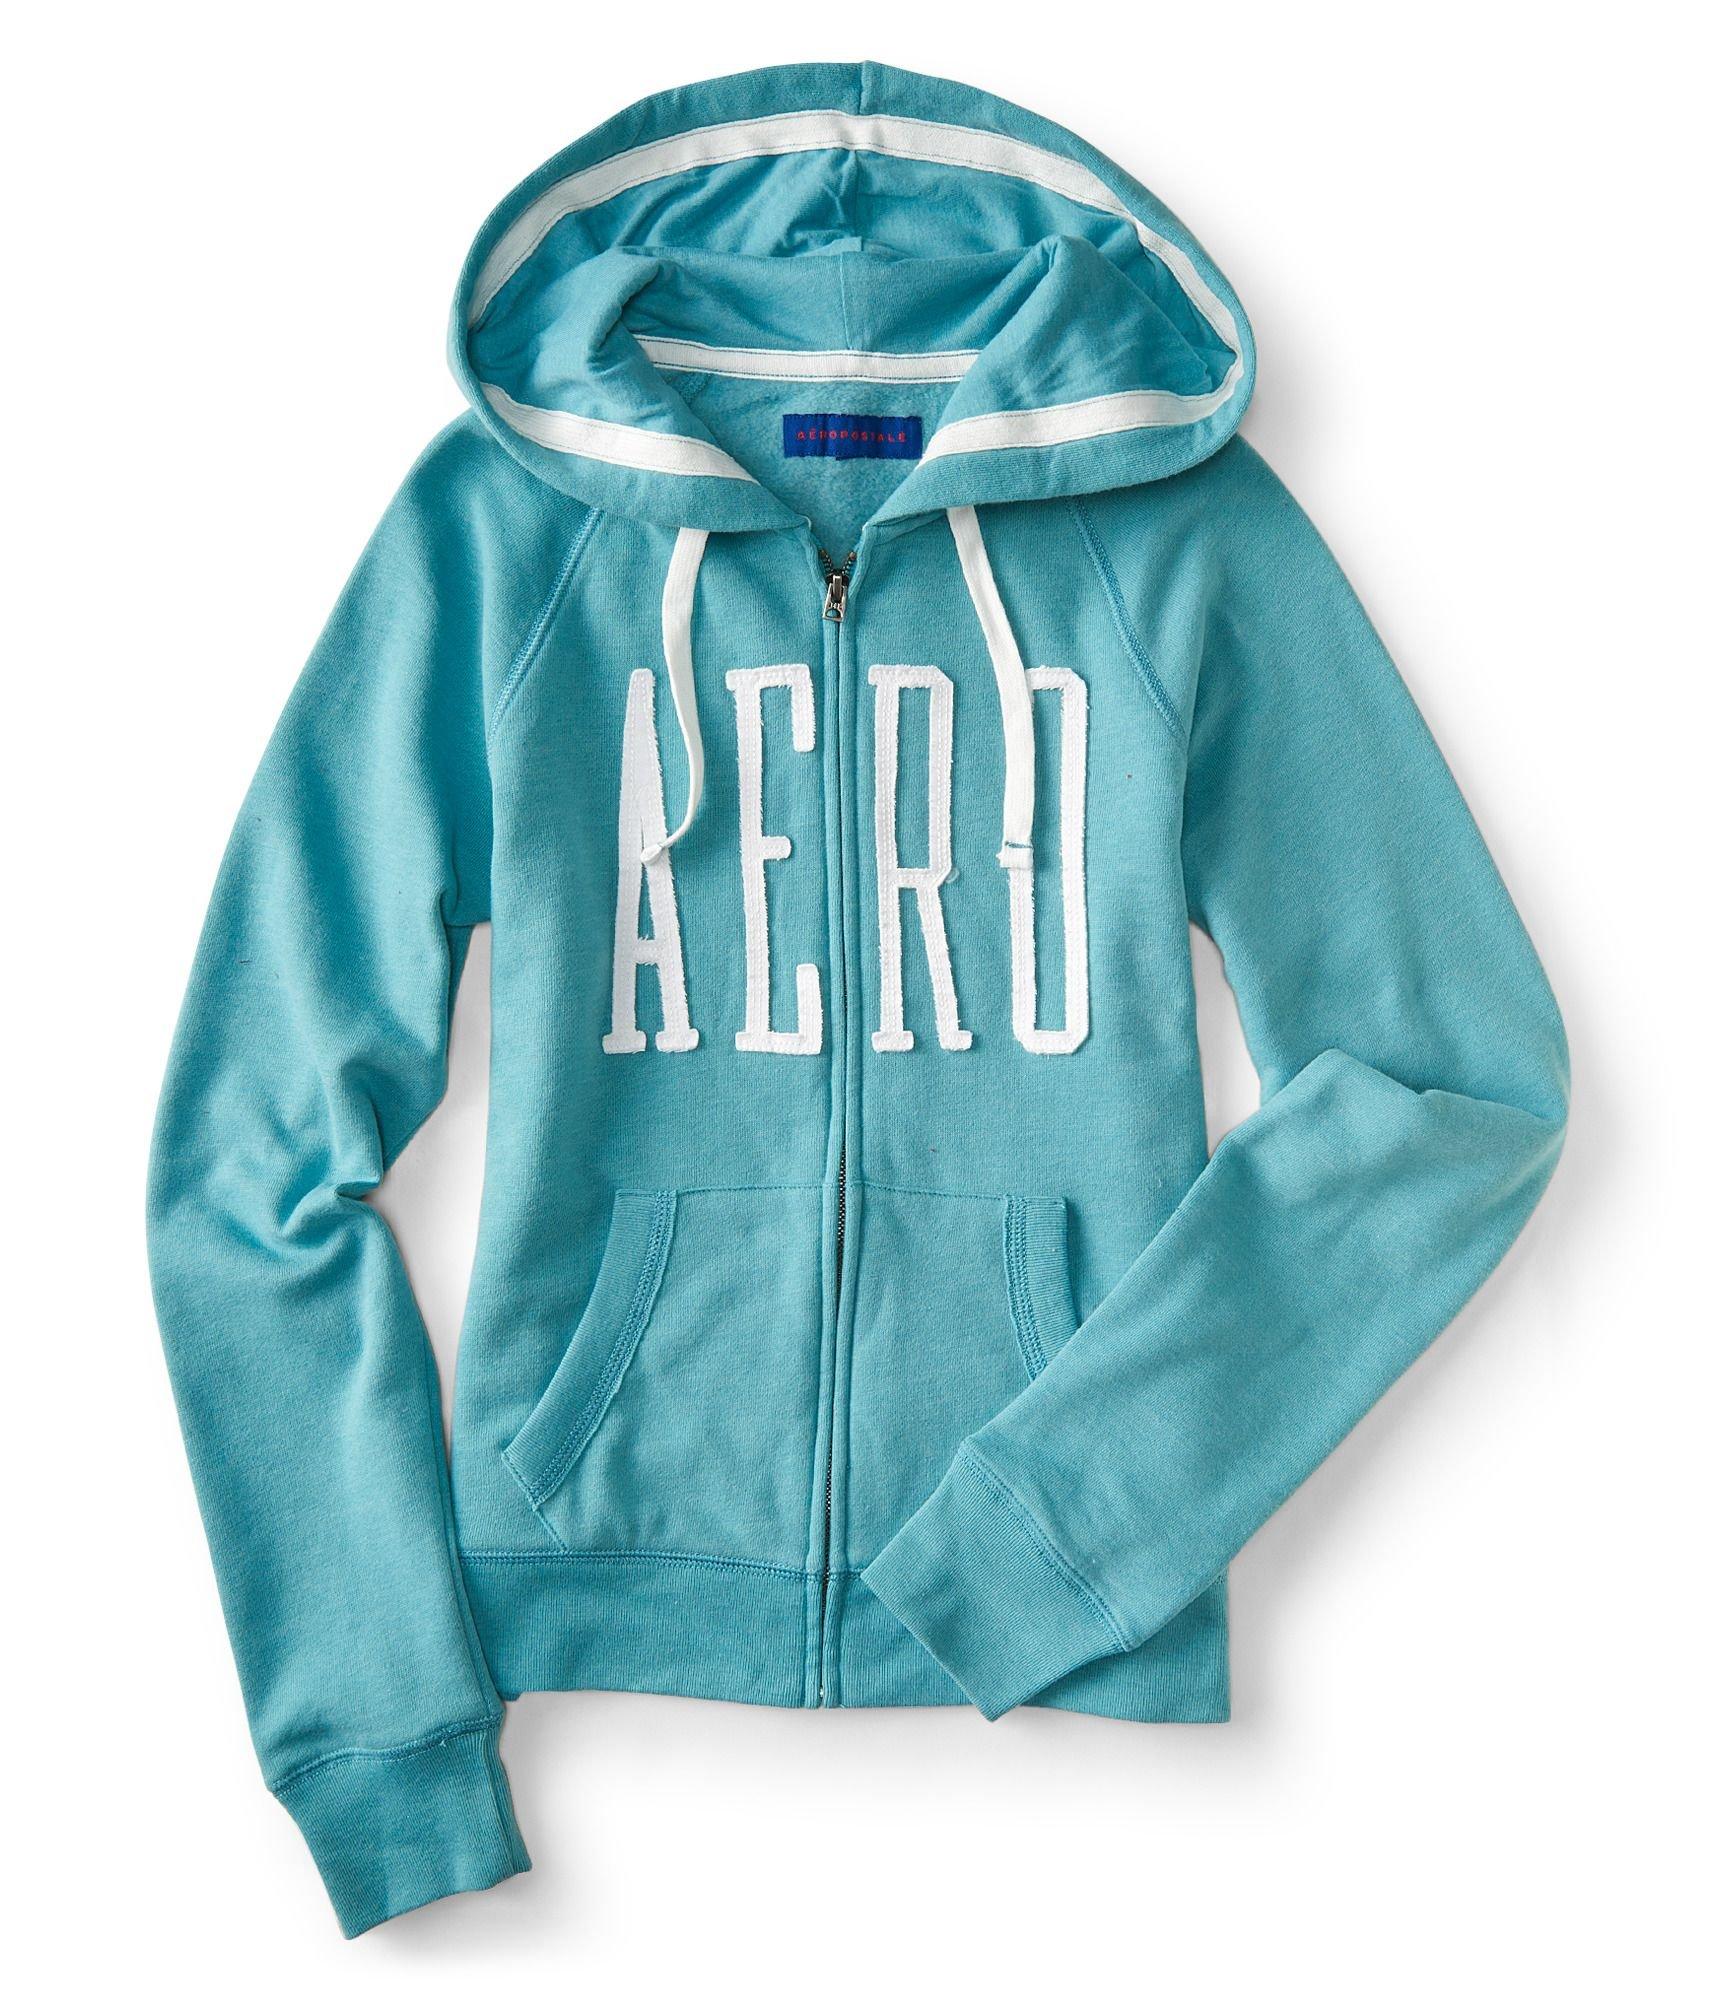 Aeropostale NY Women's Full-Zip Hoodie Sweatshirt (Aqua 1442, XL)